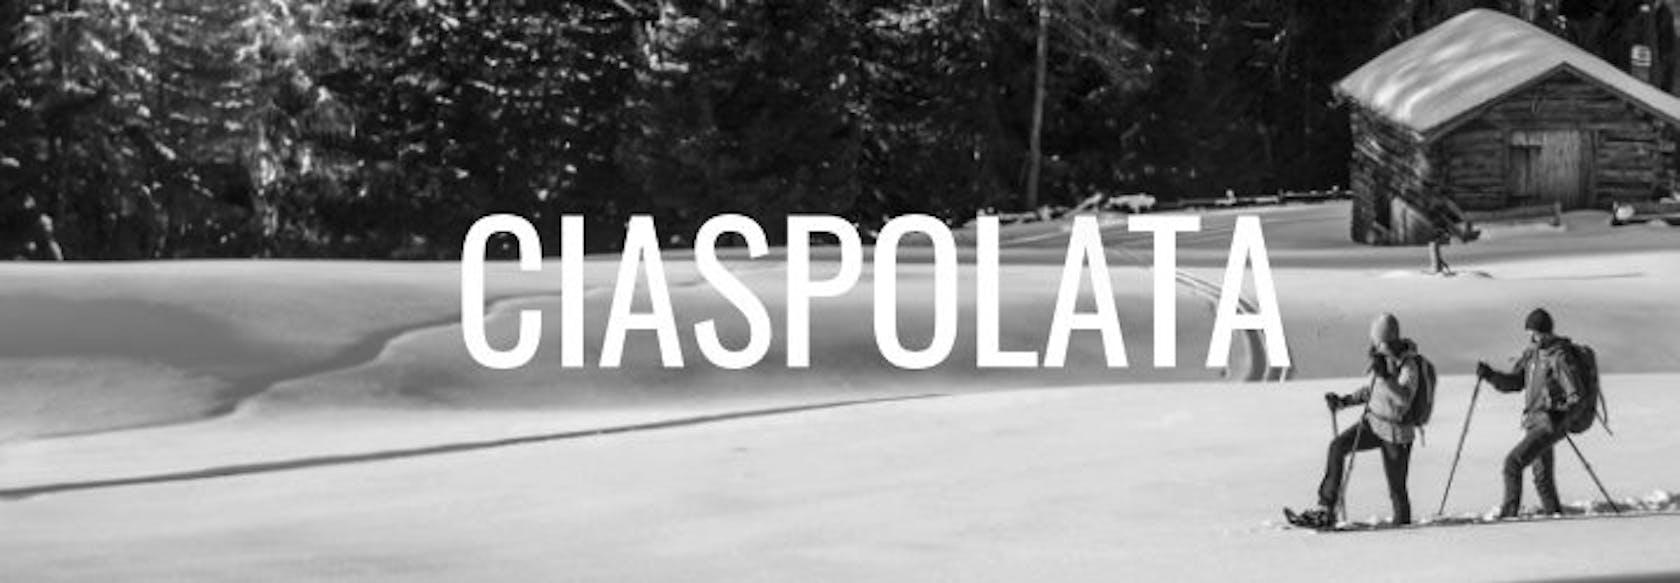 shop online ciaspolata